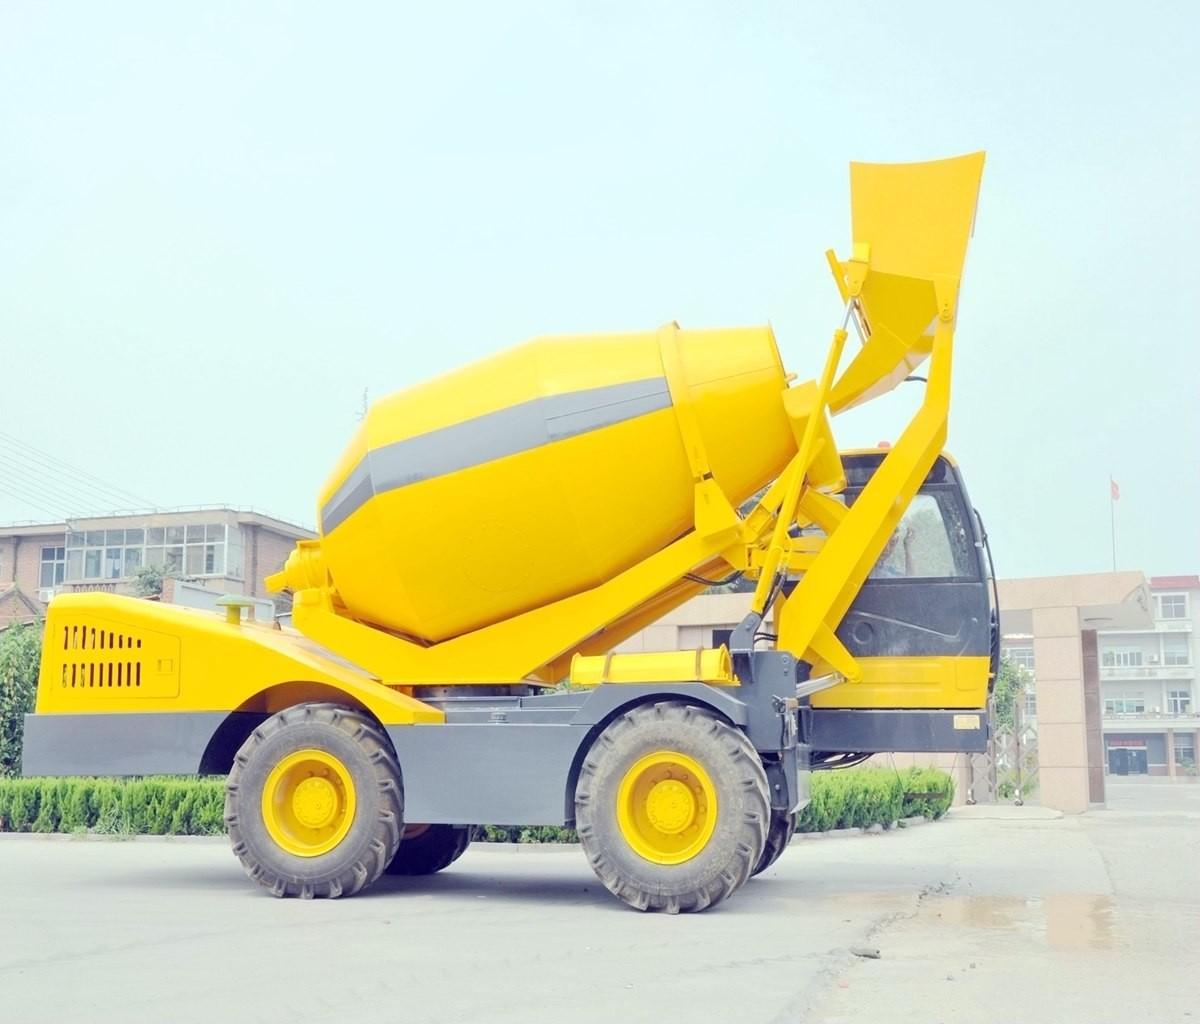 Sales Fiori Self Loading Concrete Mixer, Buy Fiori Self Loading Concrete Mixer, Fiori Self Loading Concrete Mixer Factory, Fiori Self Loading Concrete Mixer Brands